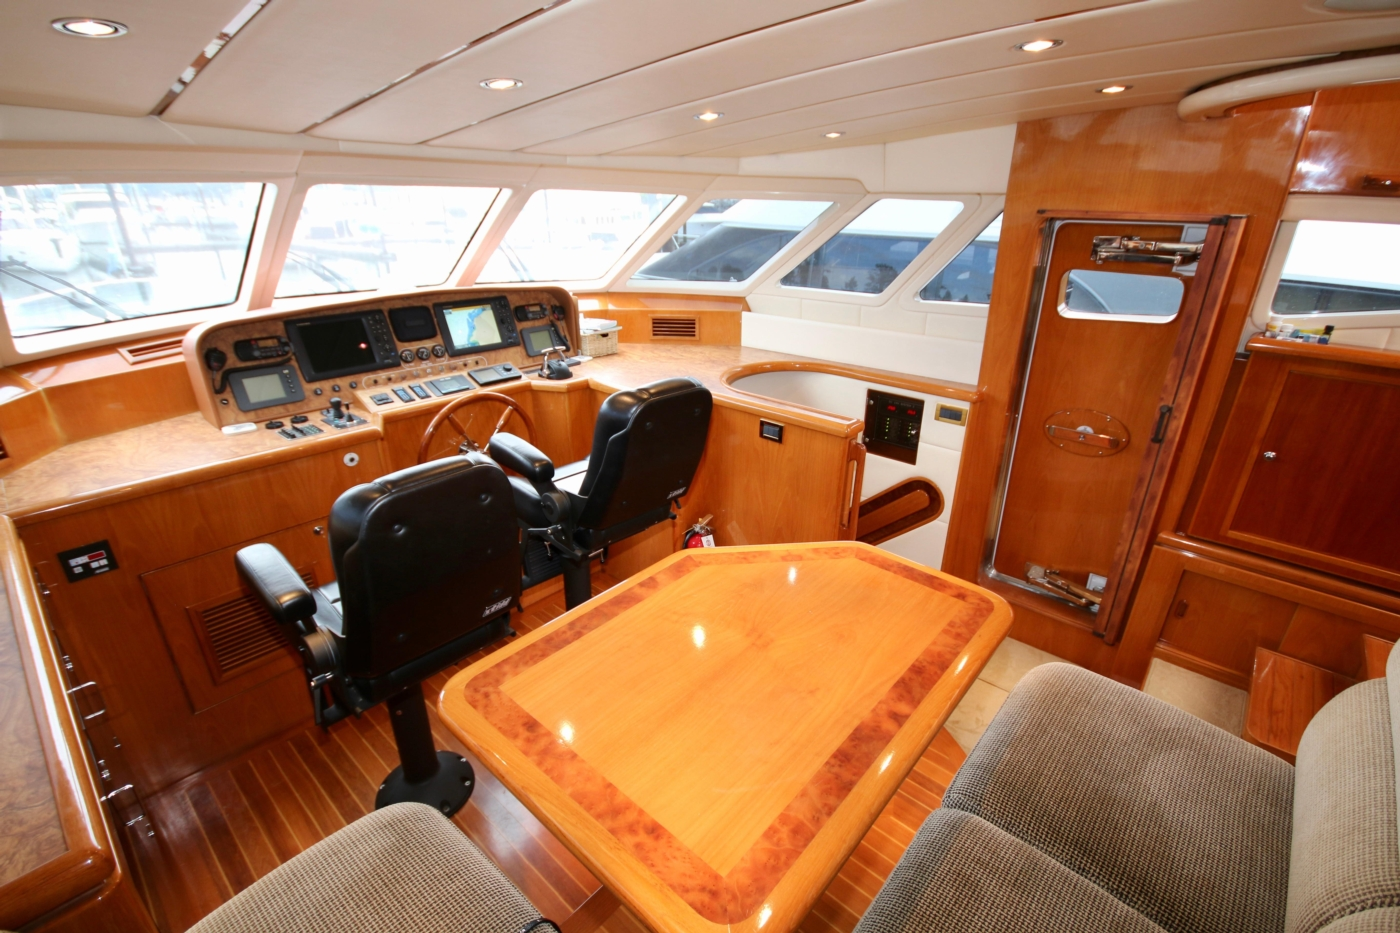 2002 Monte Fino 68, Pilothouse View Forward to Starboard